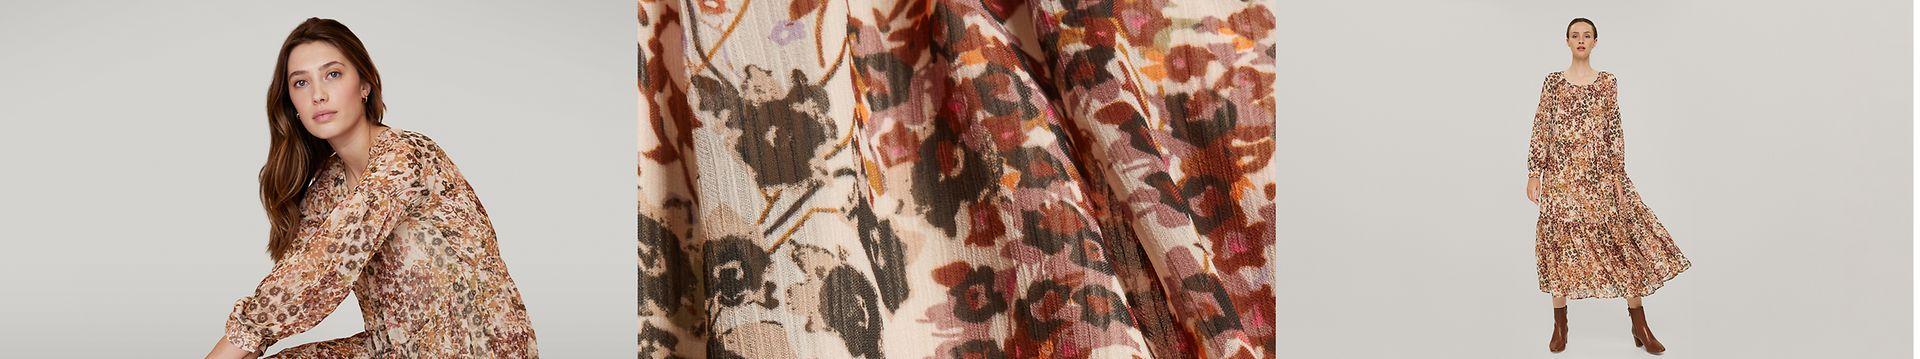 282020 - Women - pov banner - new florals - IMG